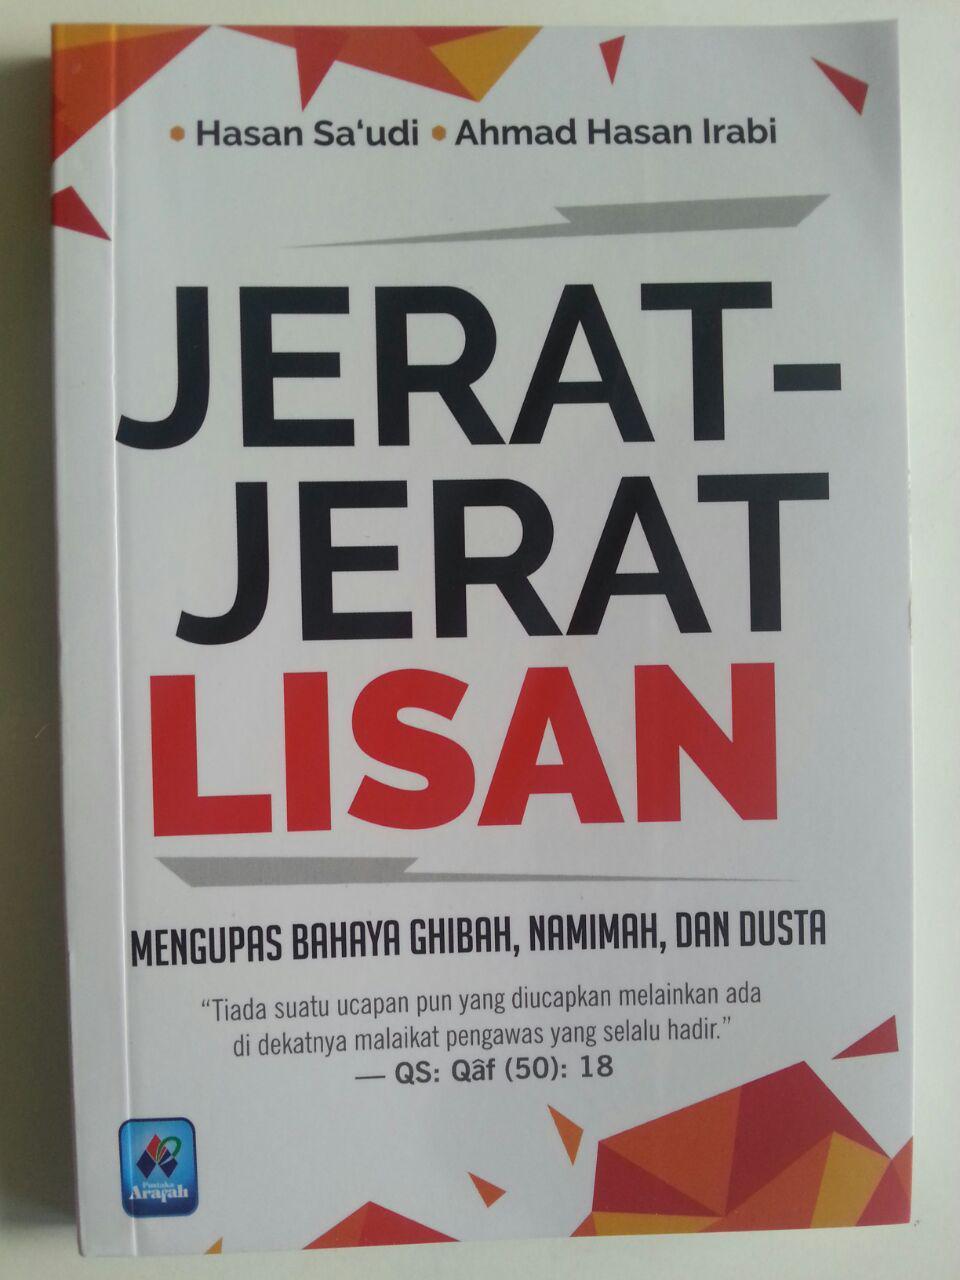 Buku Jerat-Jerat Lisan Lisan Mengupas Bahaya Ghibah Namimah cover 2